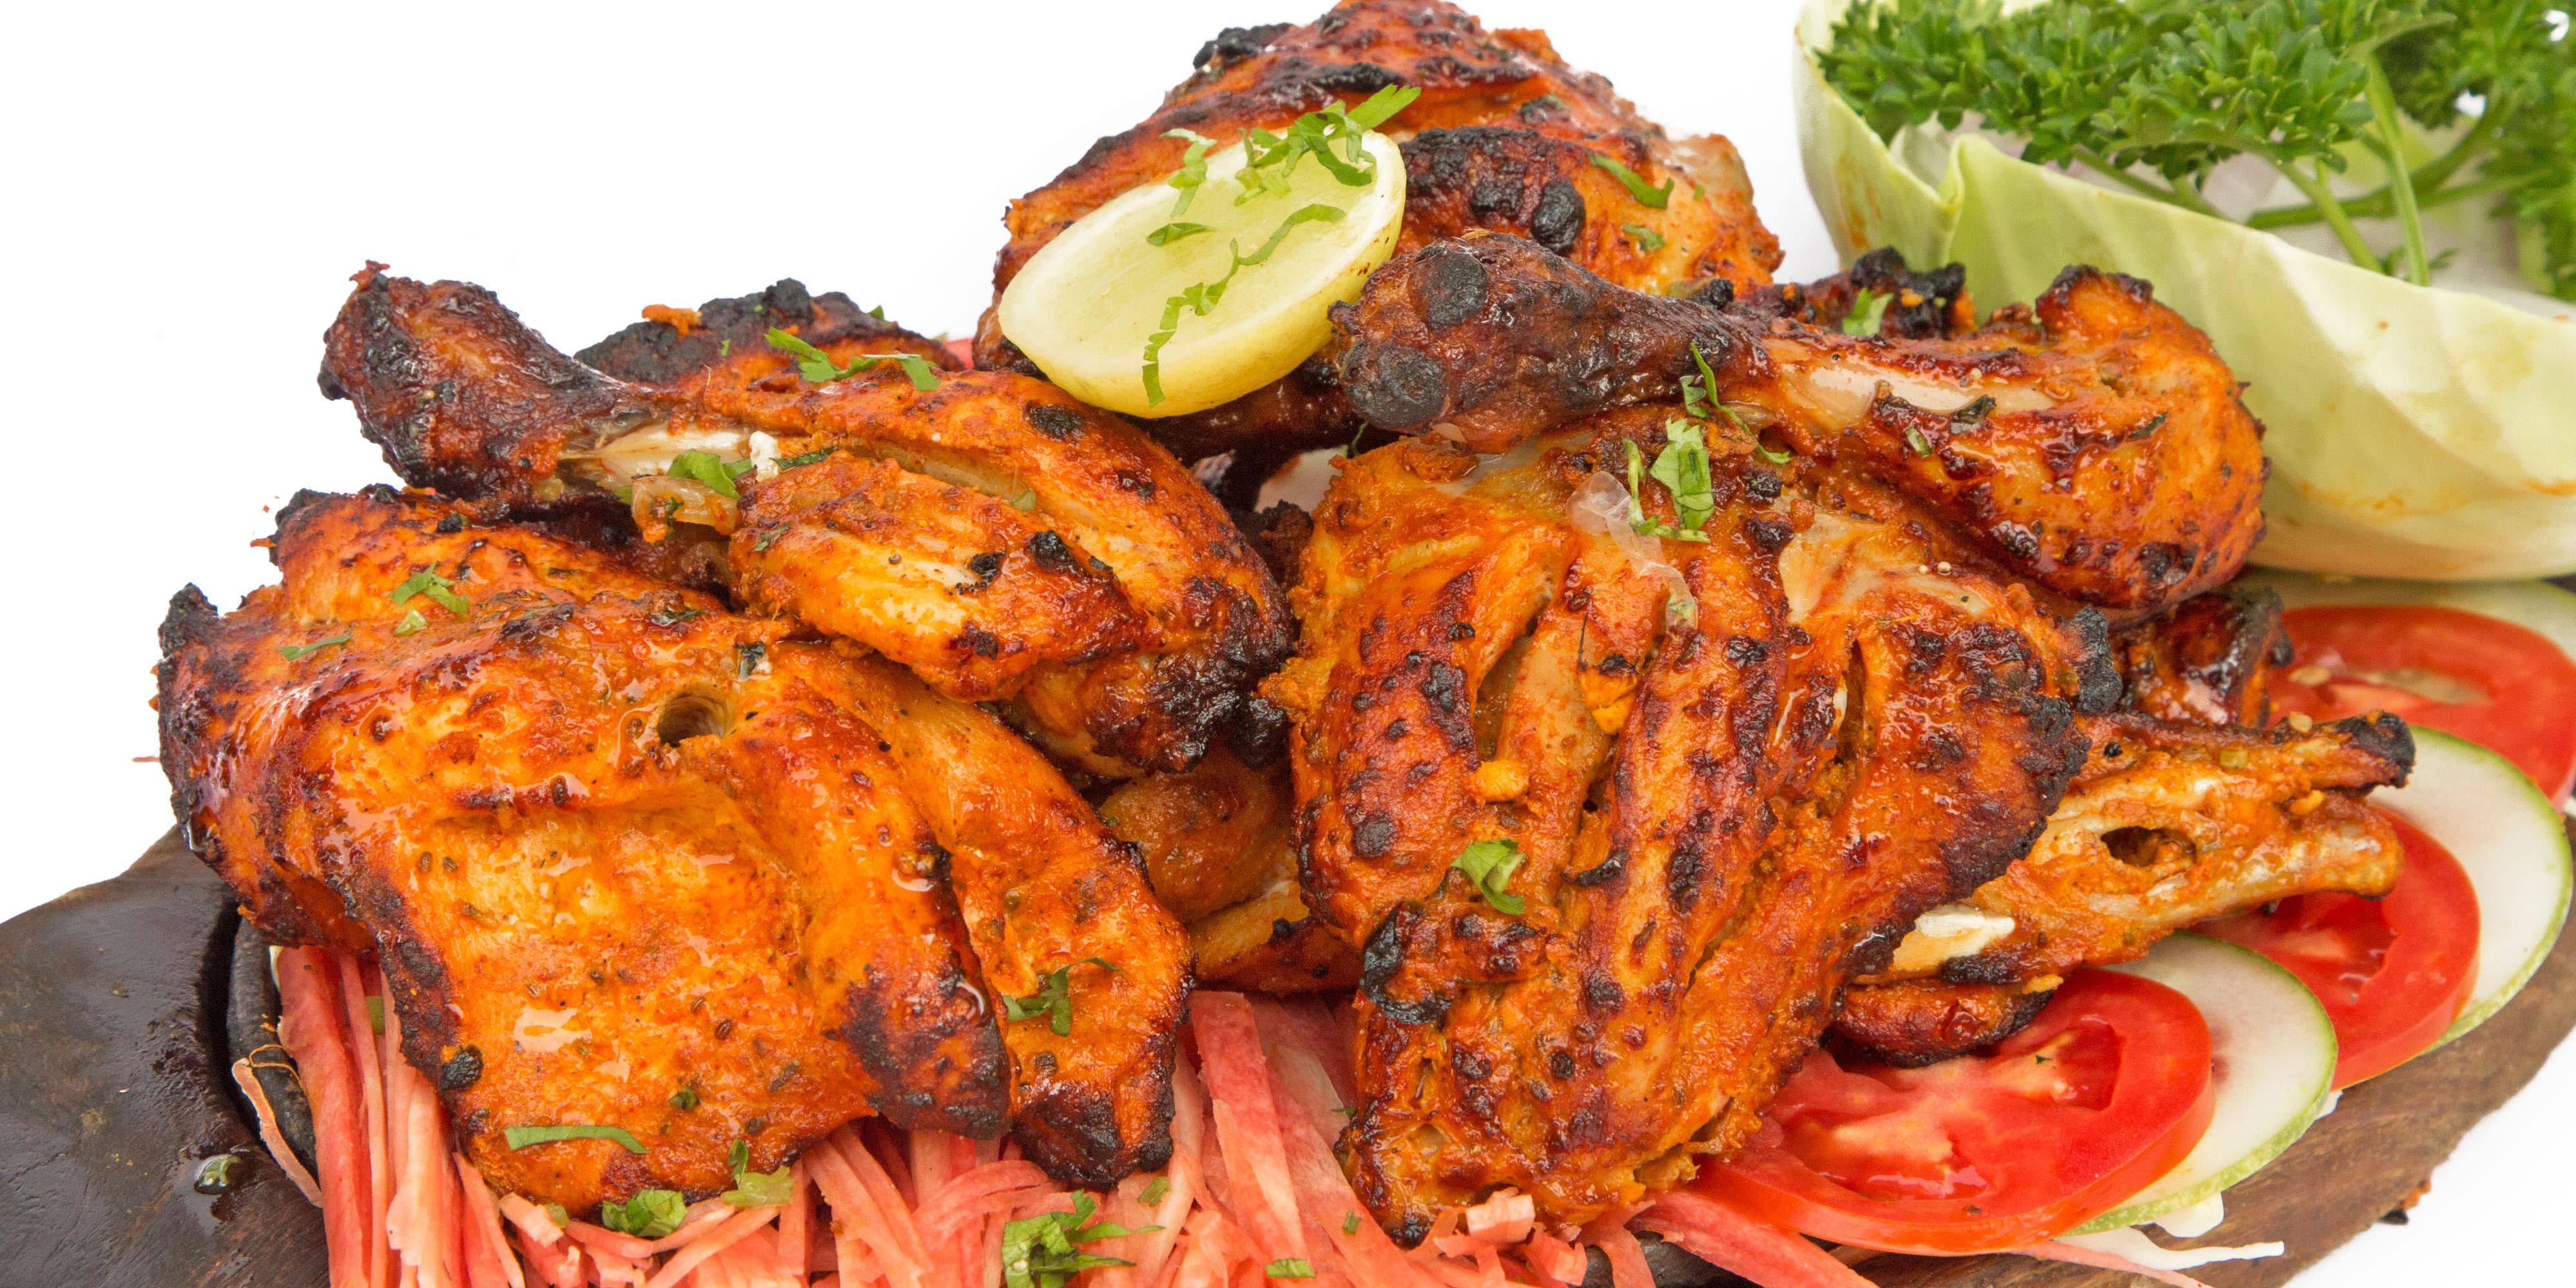 Chicken Inn | Home delivery | Order online | Pandara Road Khan Market Delhi